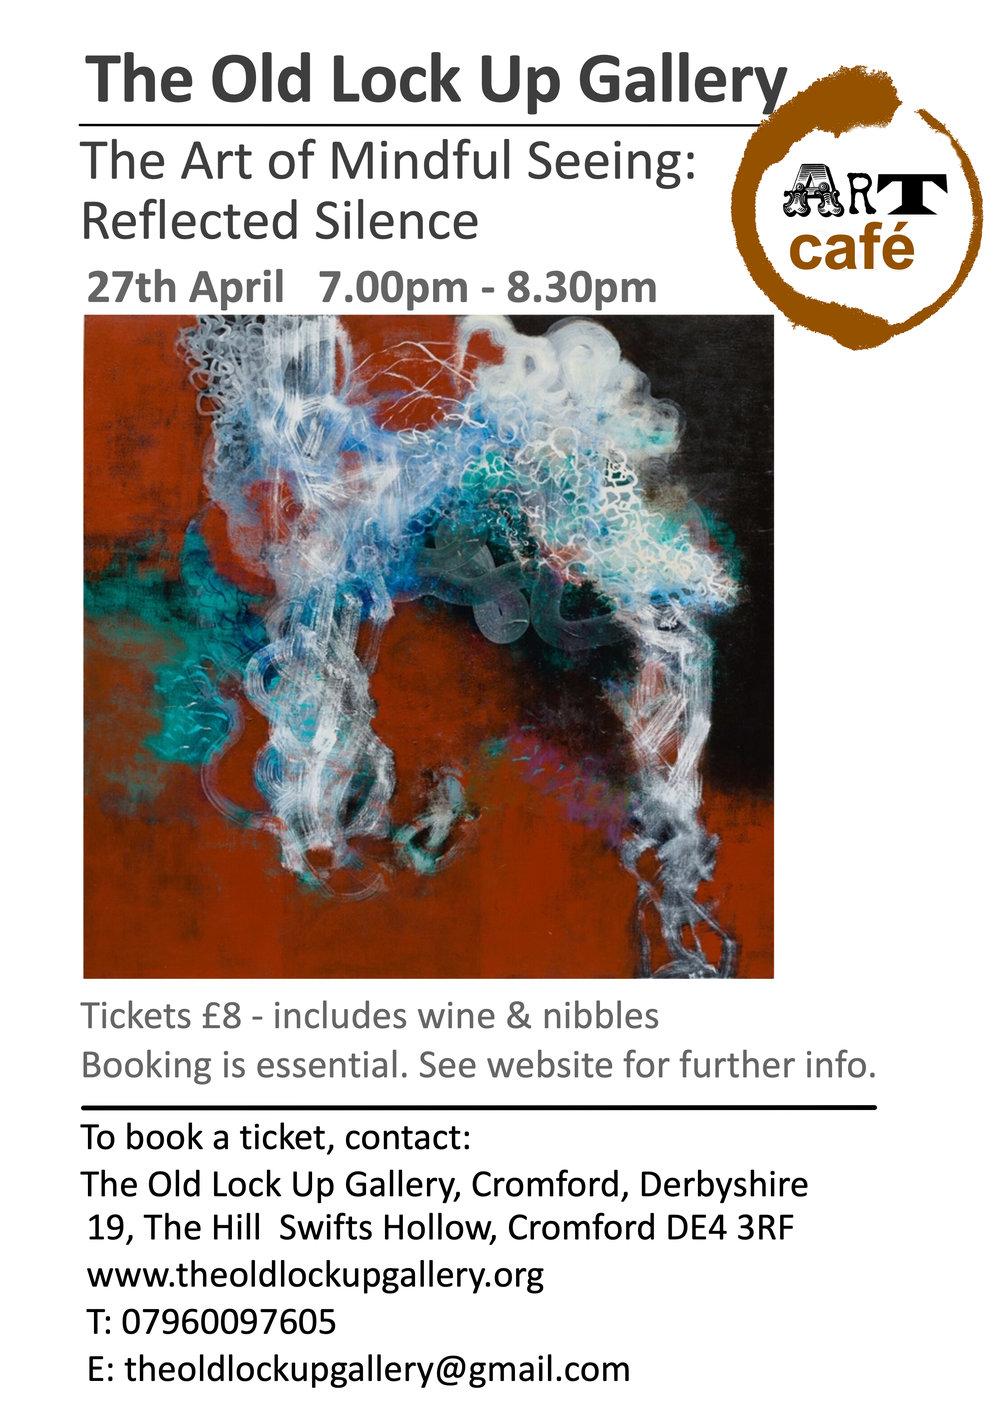 reflected silence_art_cafe.jpg